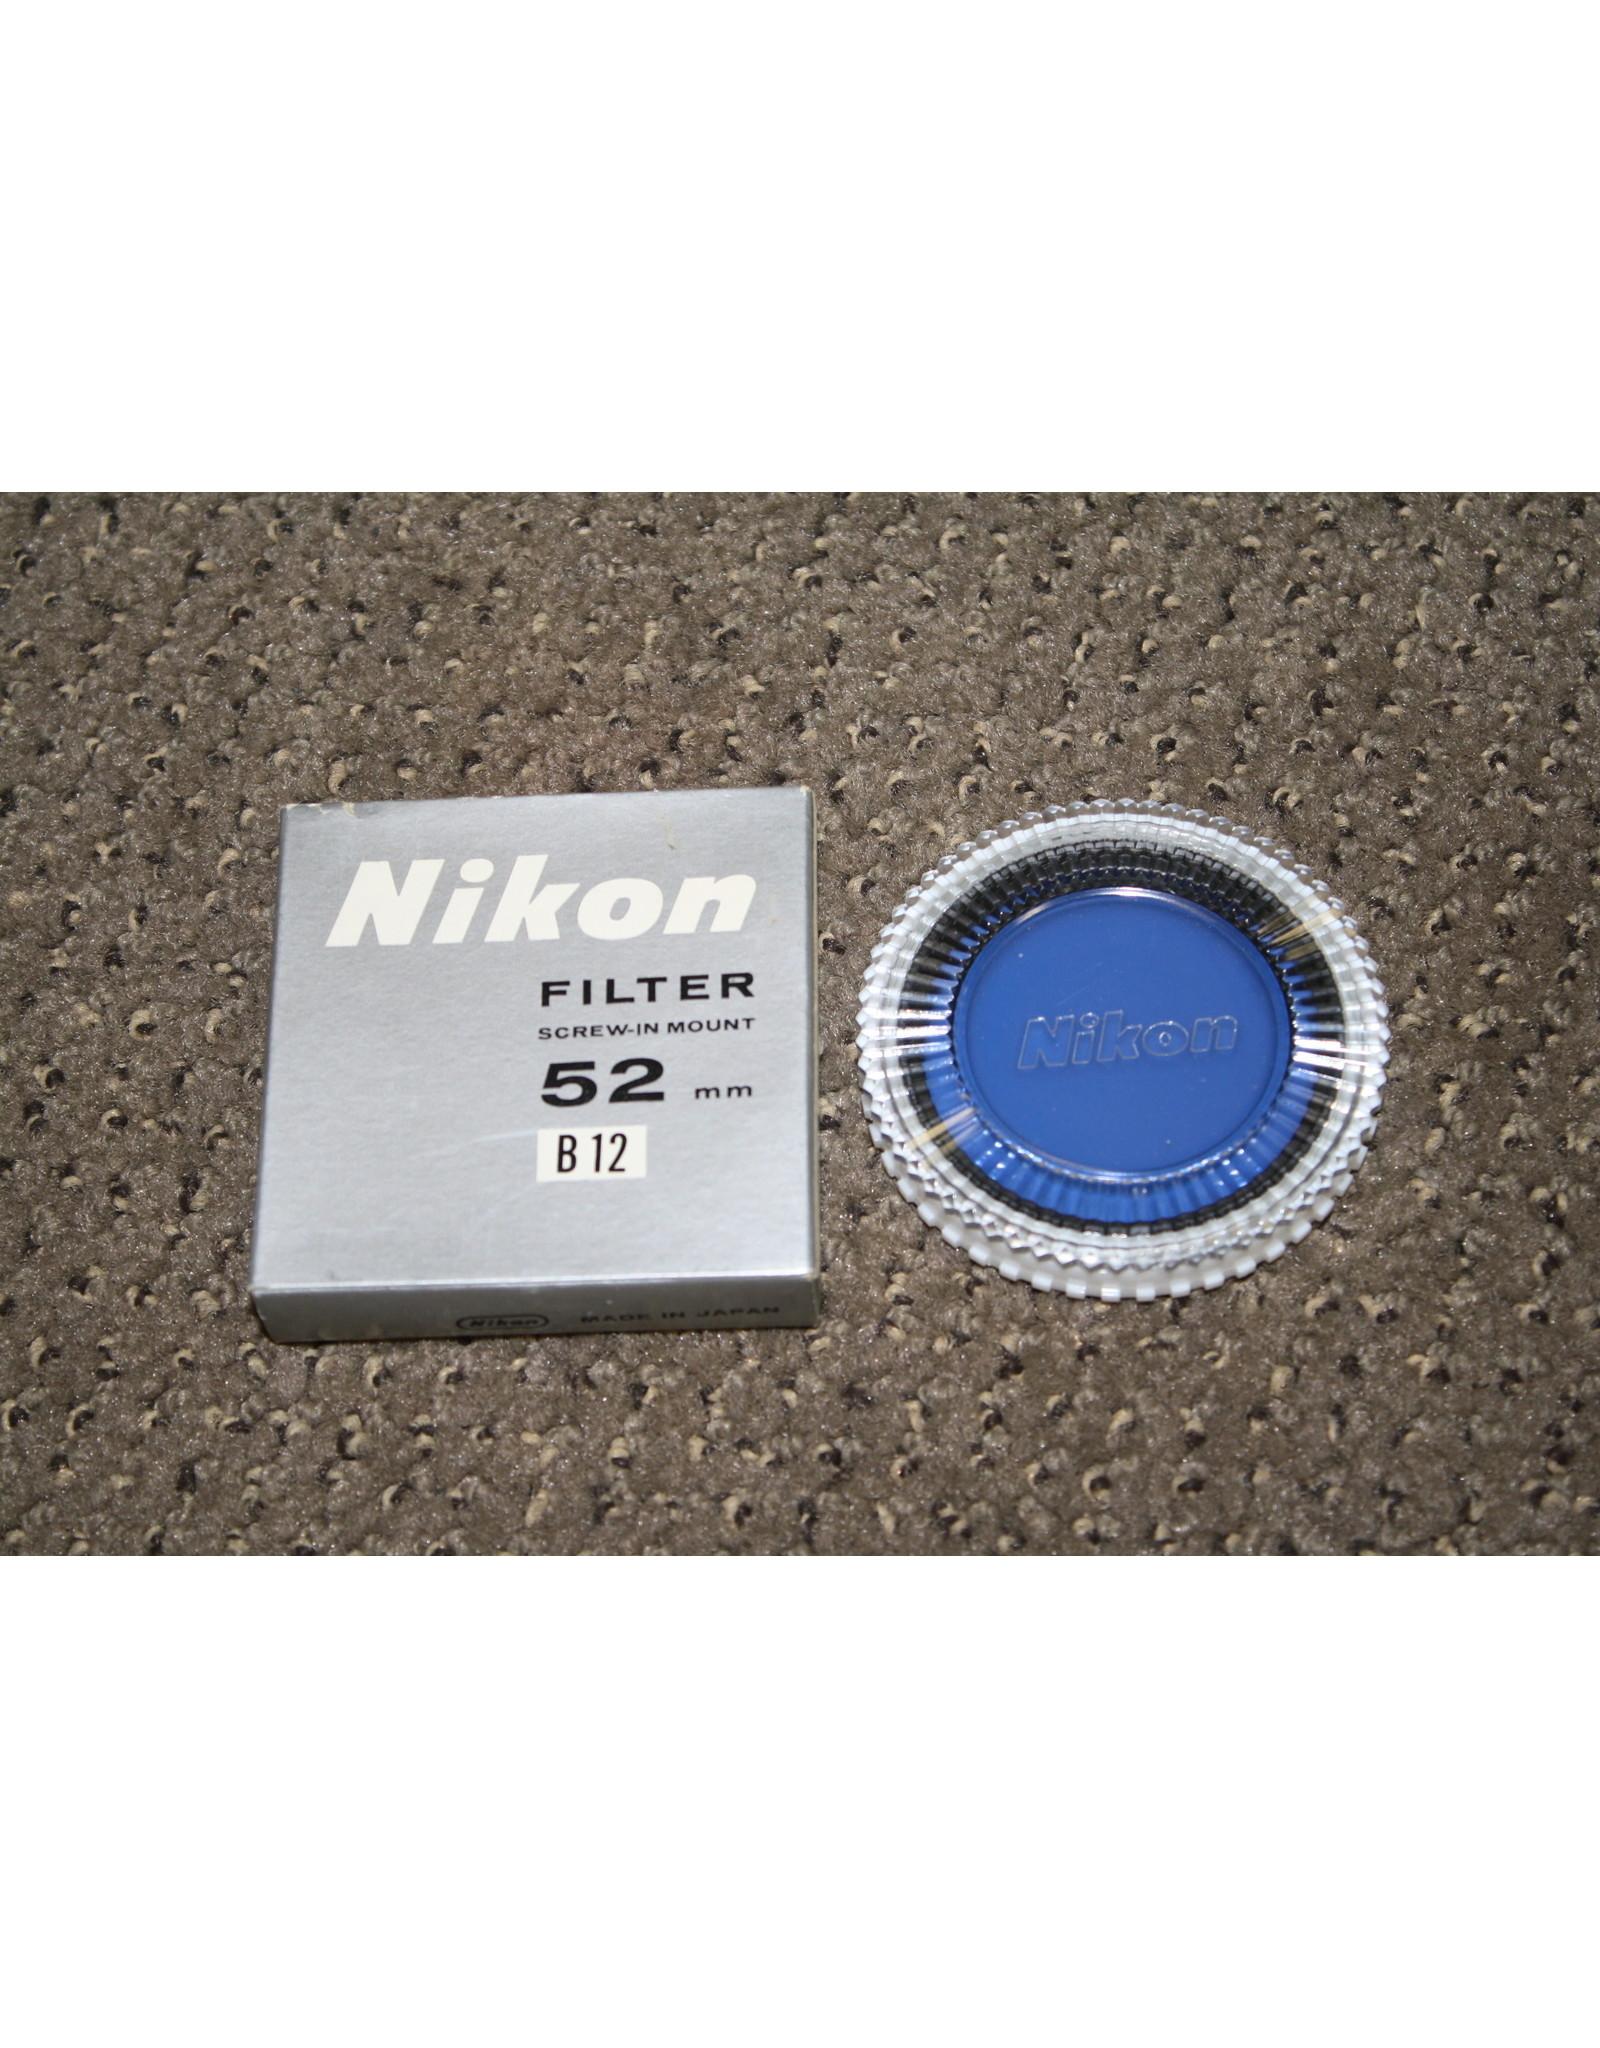 Nikon B12 52mm Filter w/ Case & Box